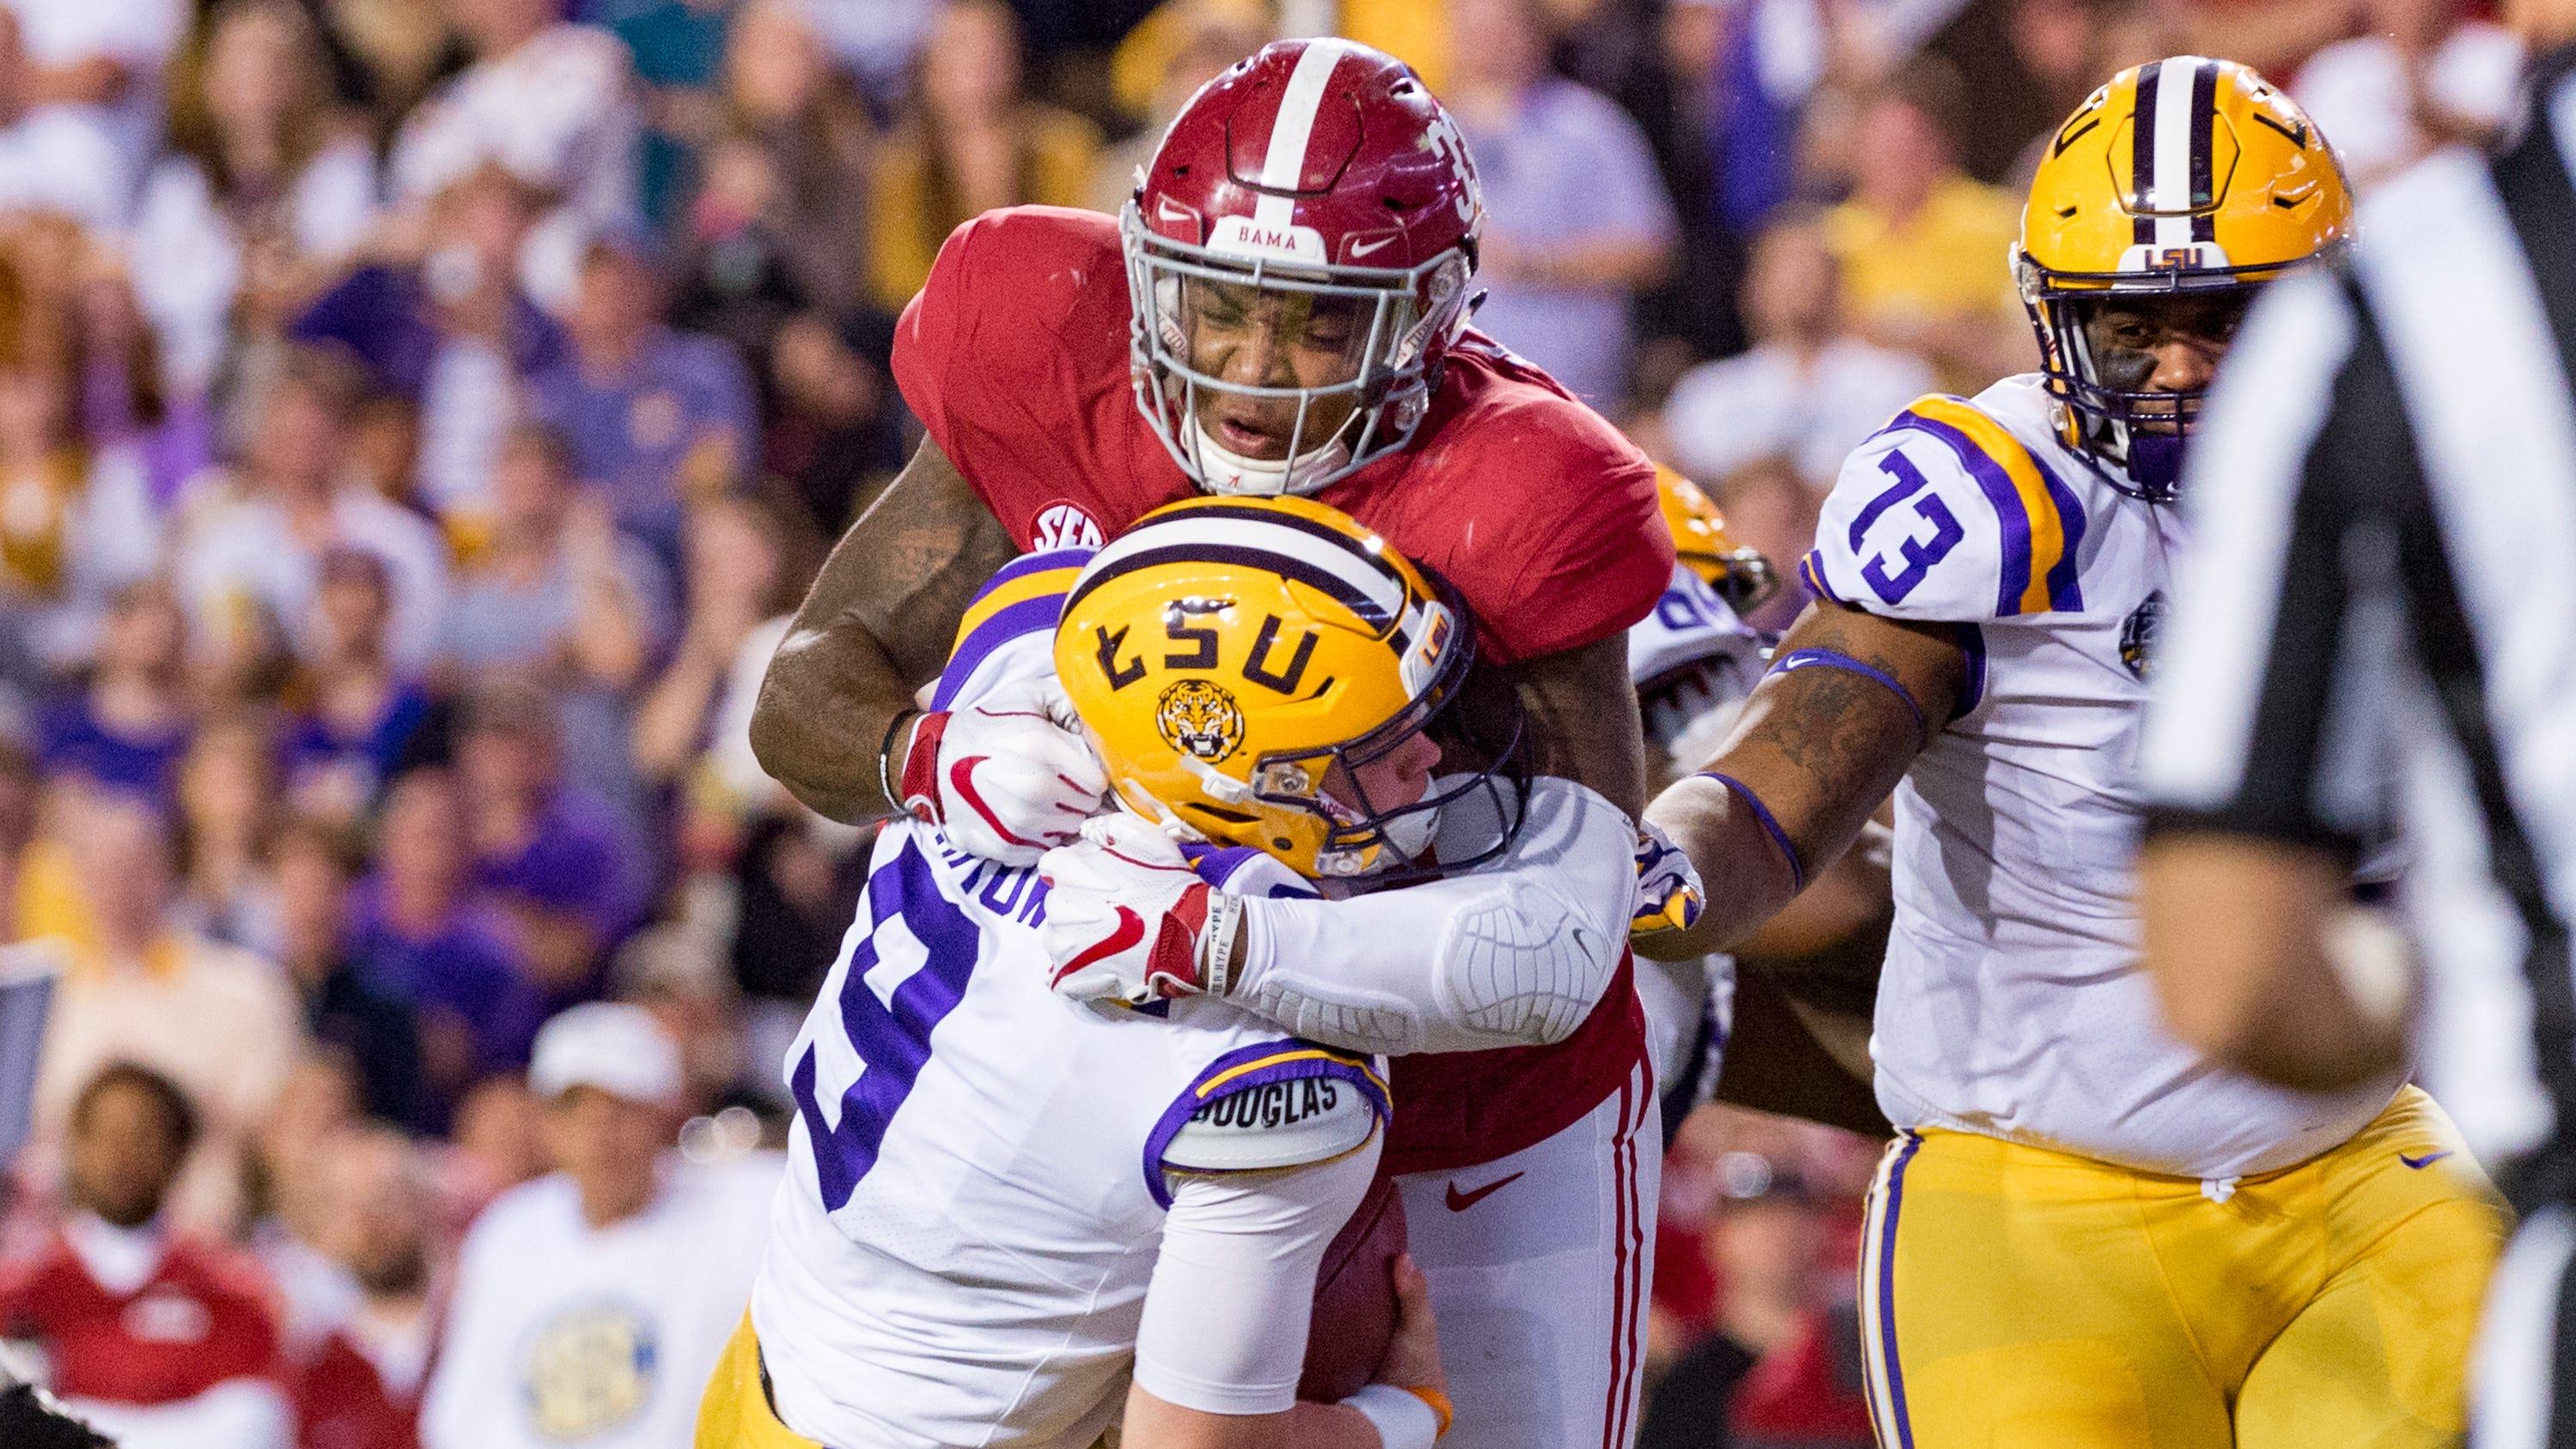 Tigers quarterback Joe Burrow is sacked by Alabama linebacker Anfernee Jennings as The No. 4-ranked LSU Tigers take on the No. 1 Alabama Crimson Tide in Tiger Stadium Saturday, Nov. 3, 2018.